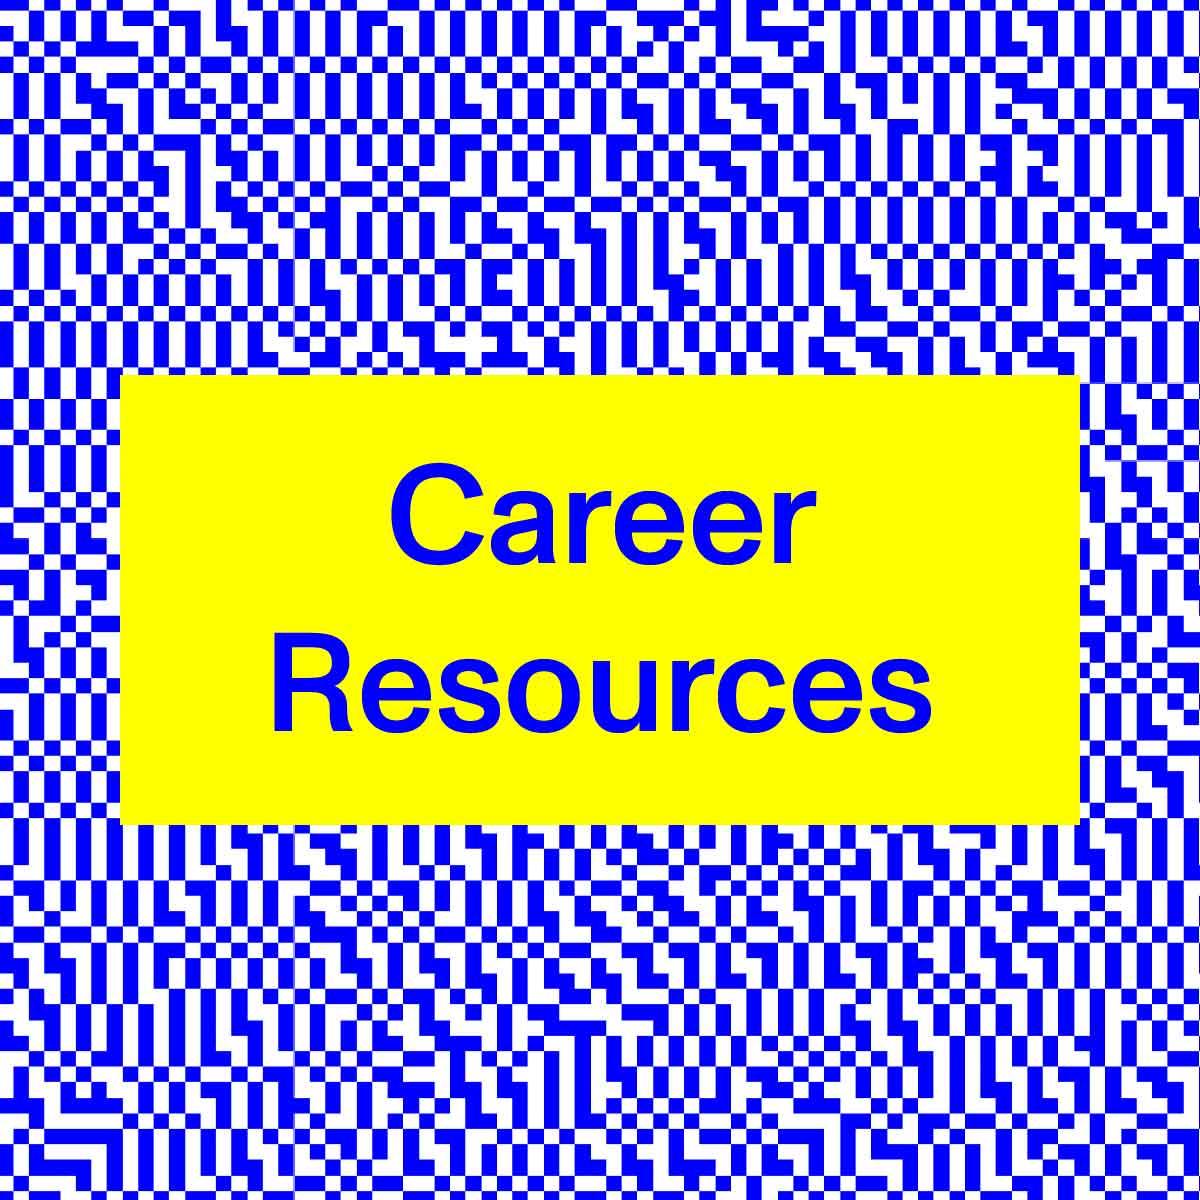 MDes-Portal-Career-Resources